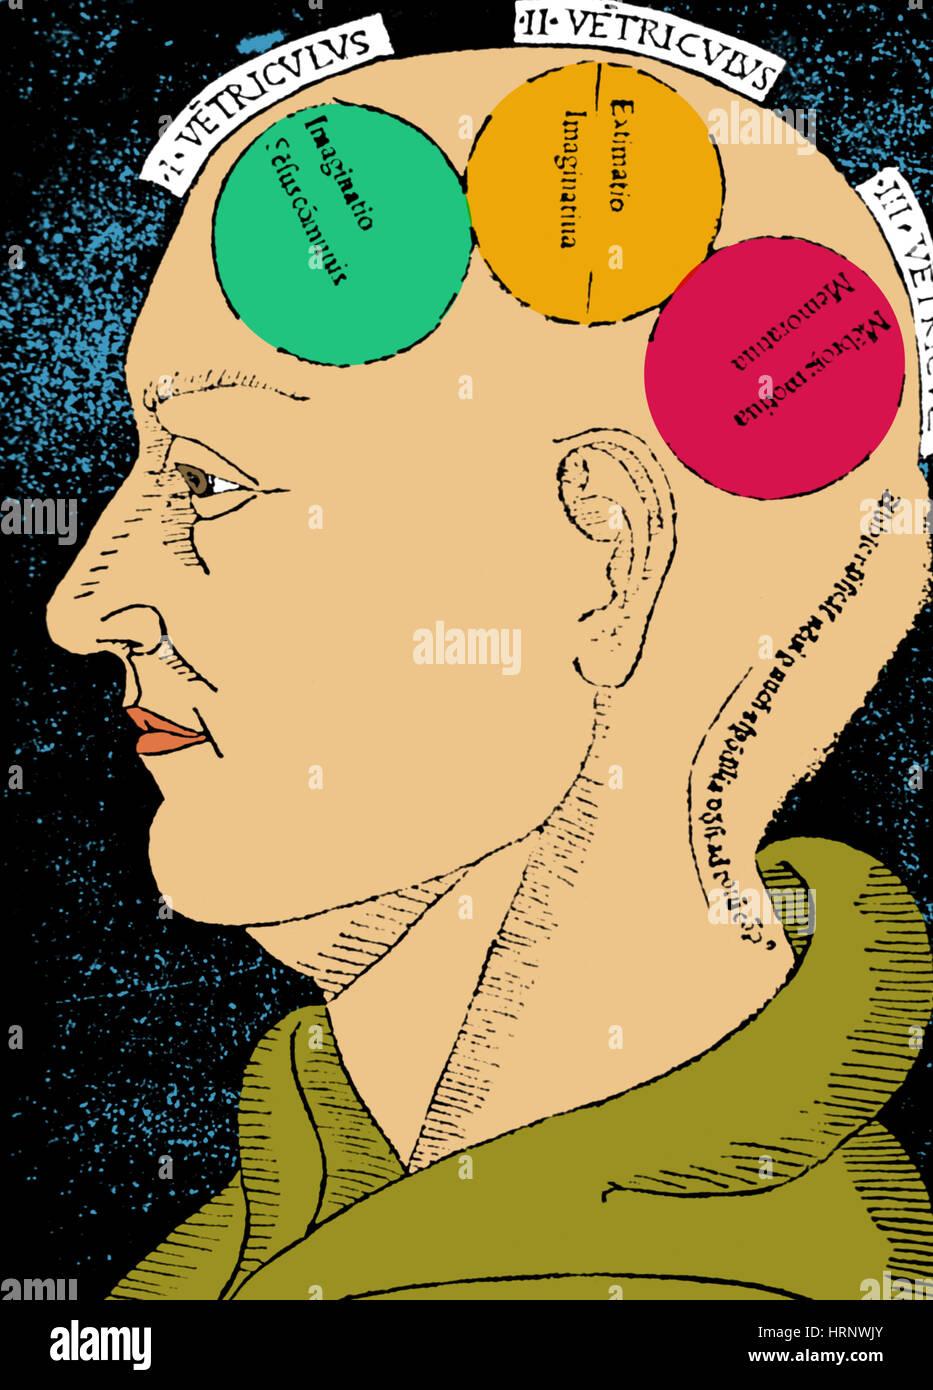 As funções do cérebro, Albertus Magnus xilogravura Imagens de Stock